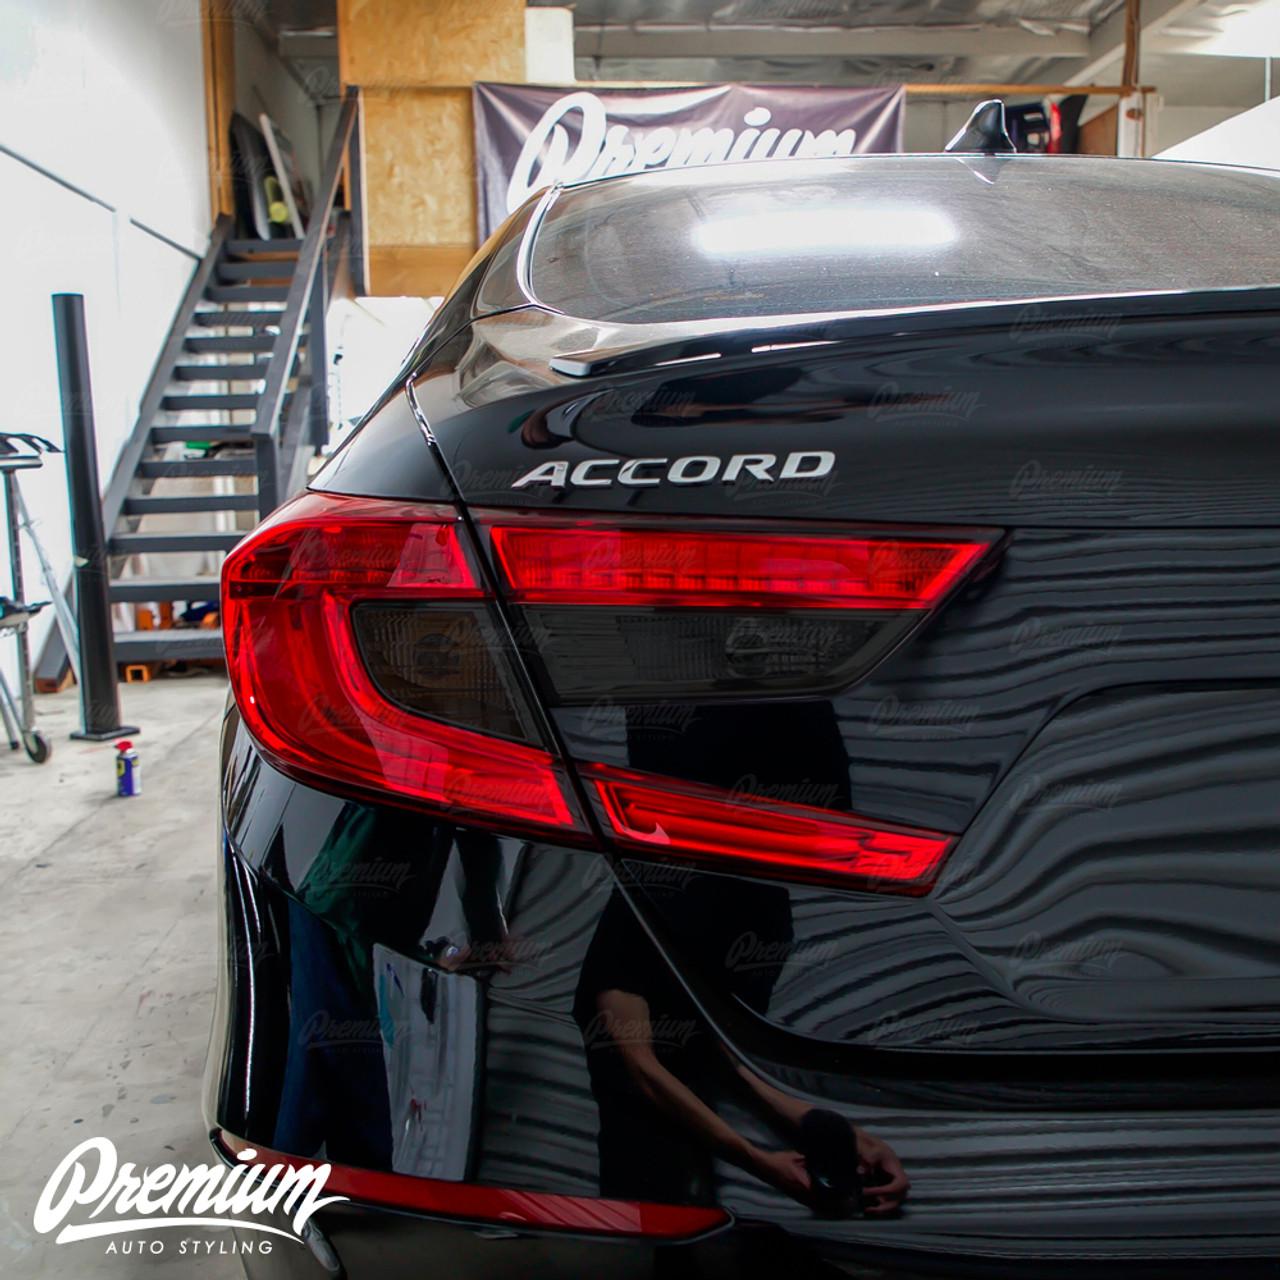 Smoked Reverse Tail Light Insert 2018 Accord Premium Auto Styling